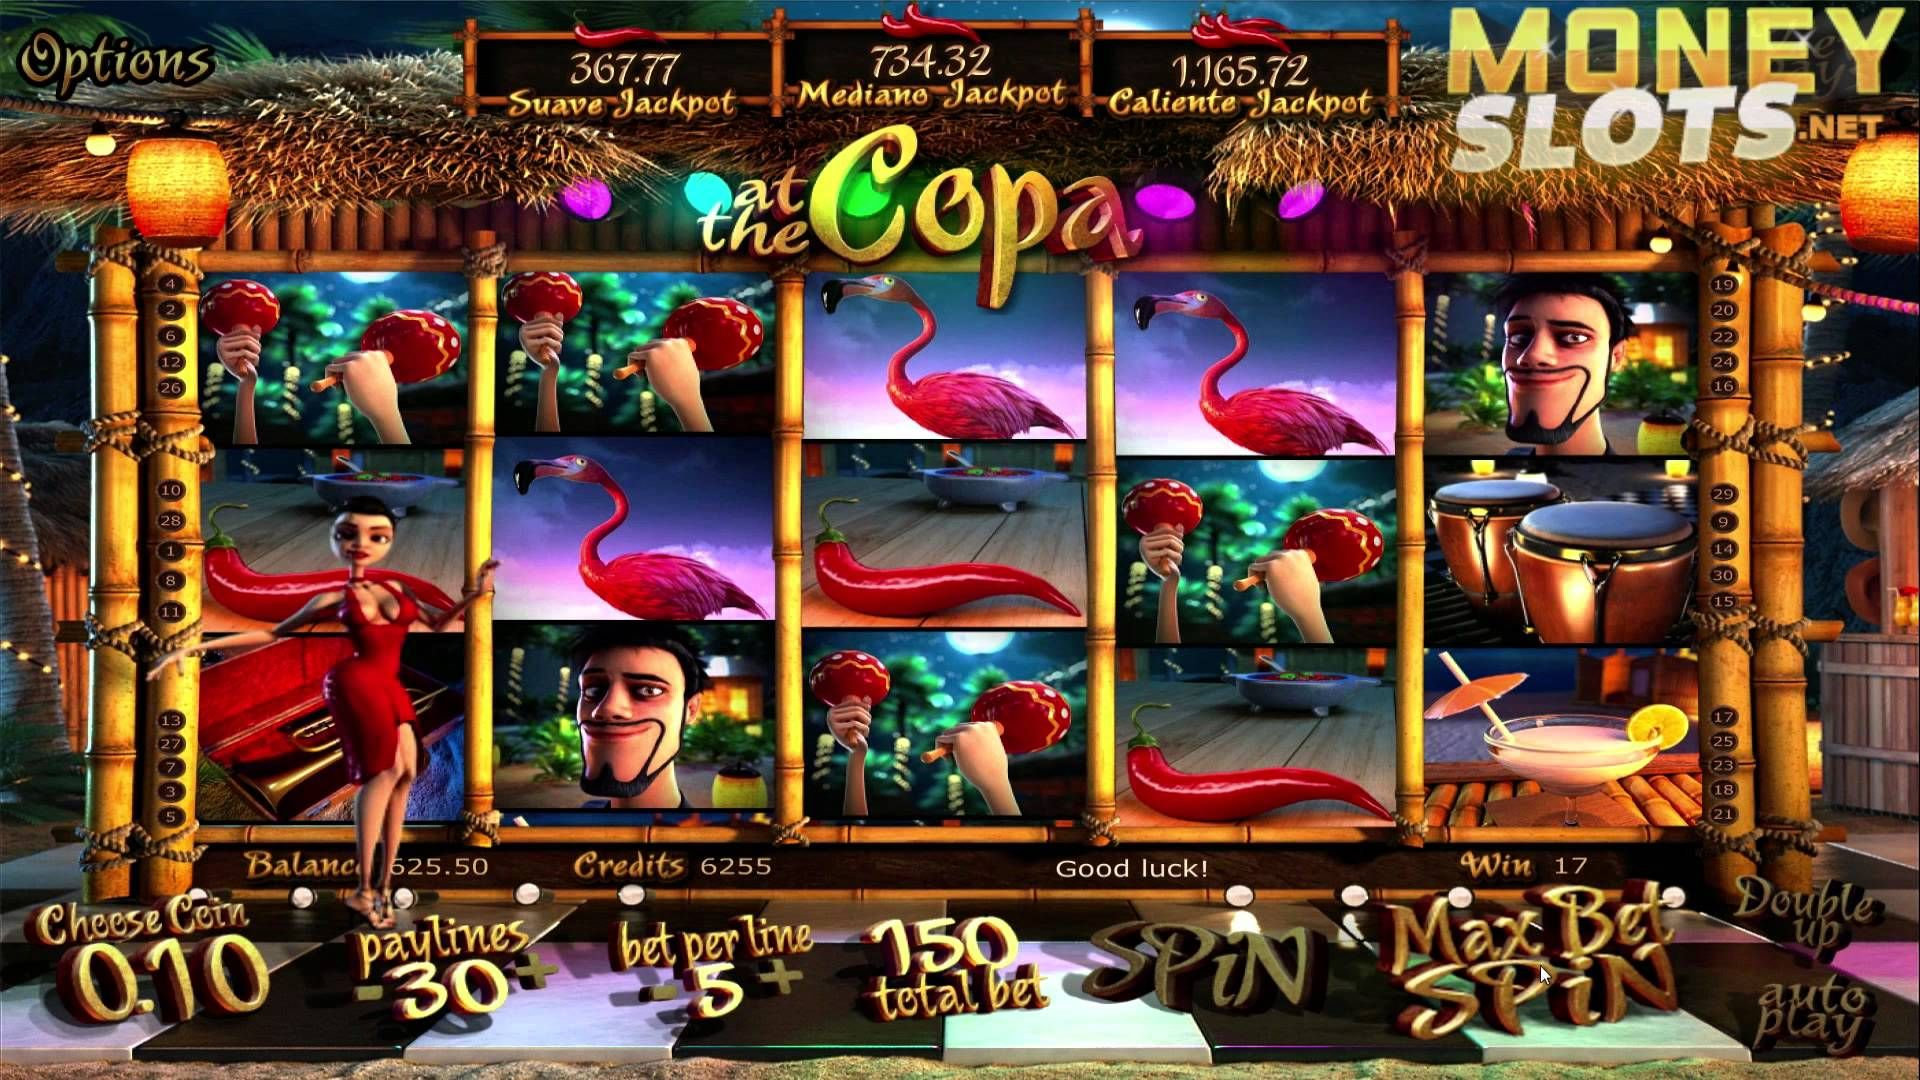 At The Copa Slot Machine